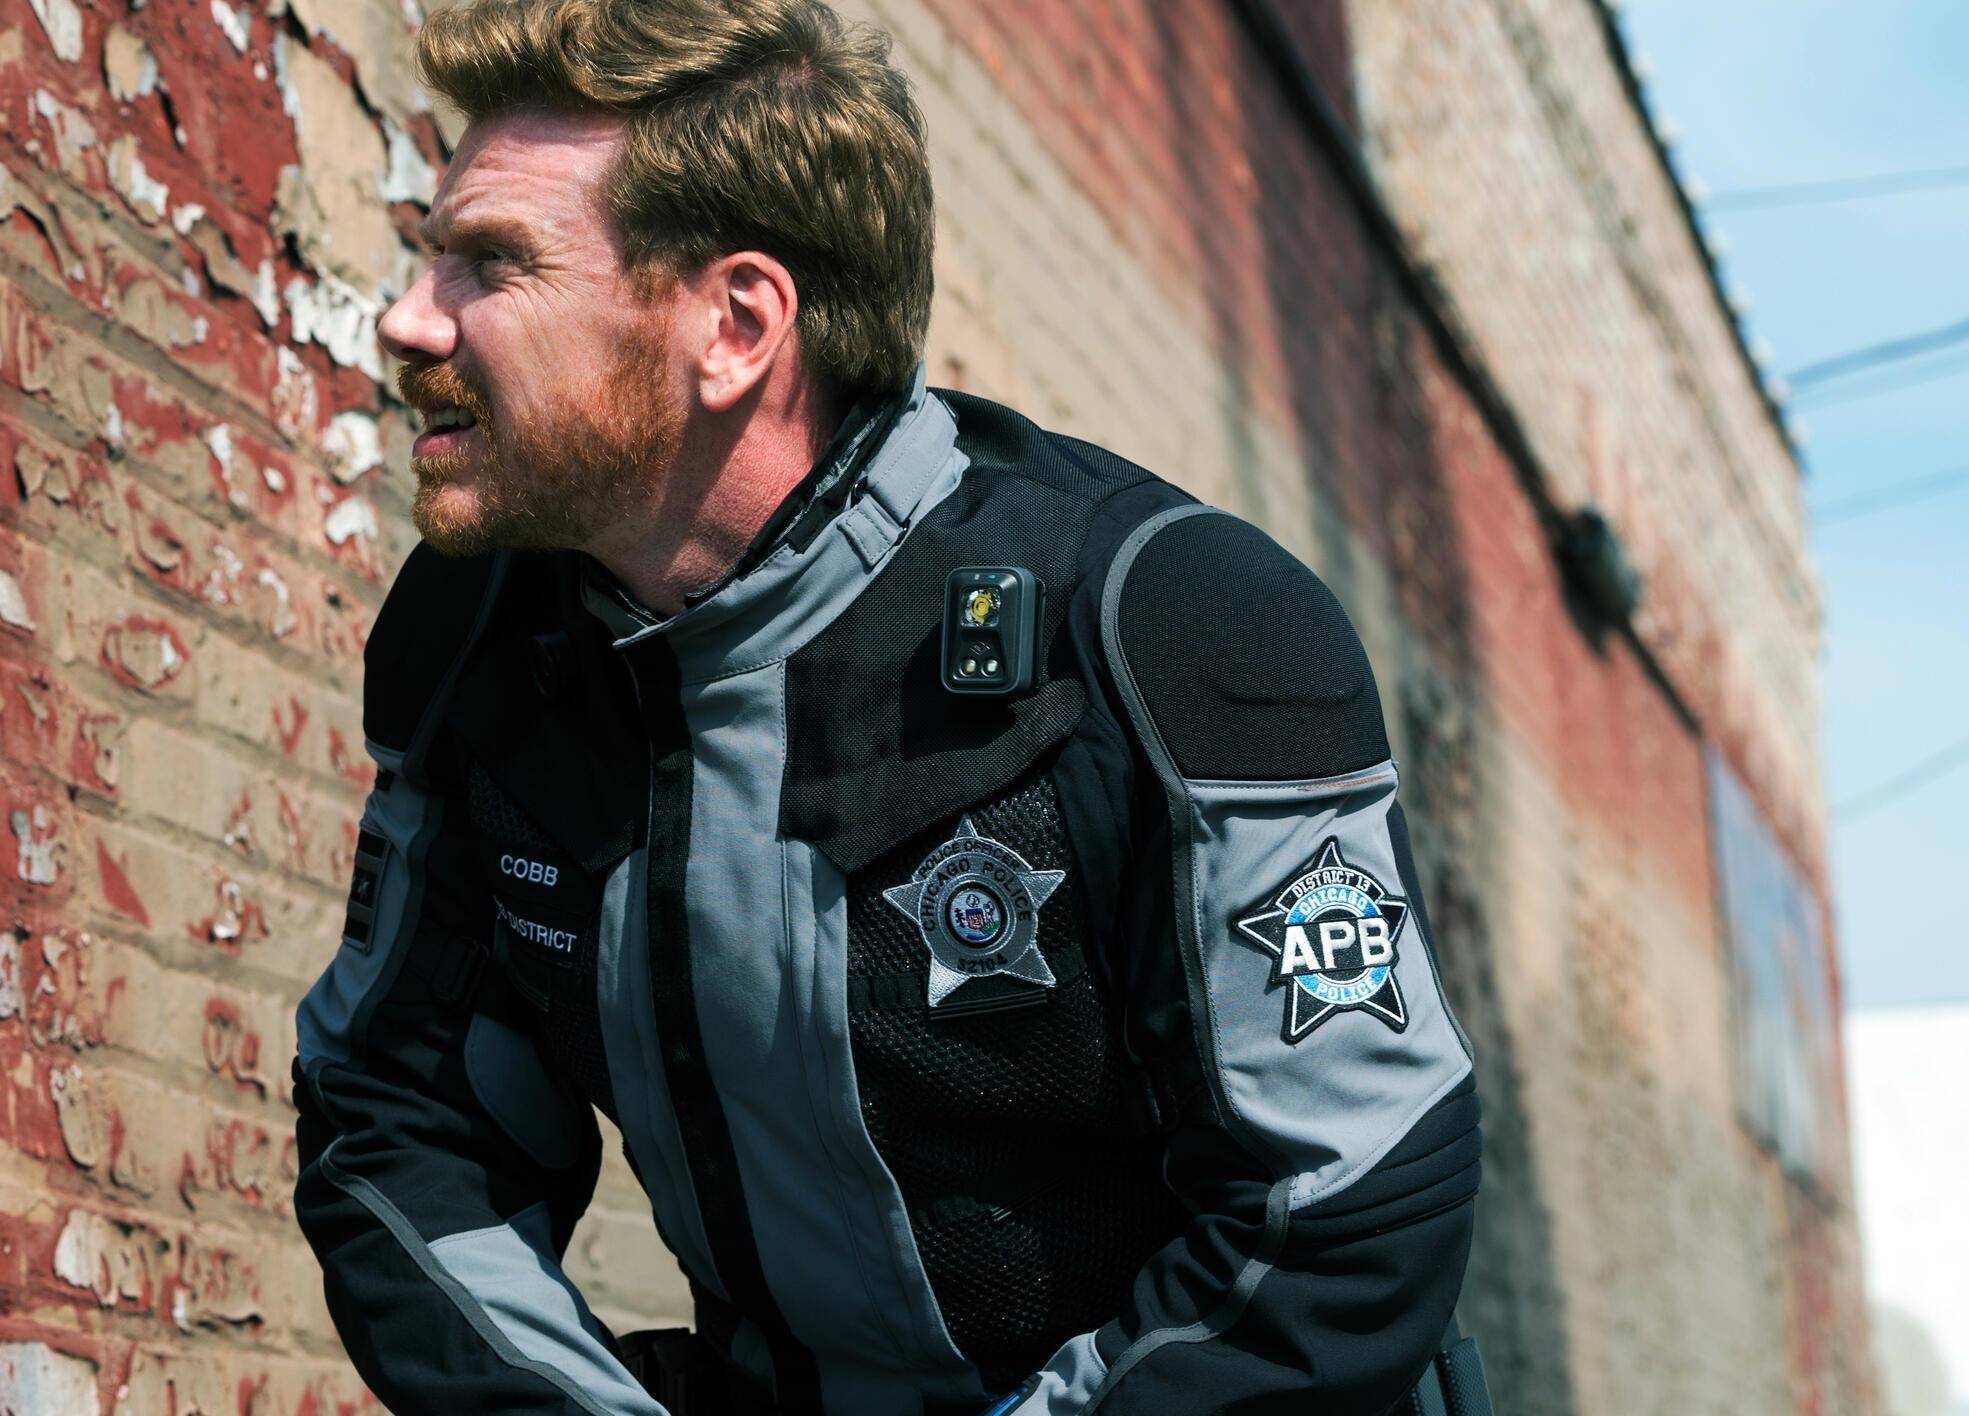 Apb Die Hightech Cops